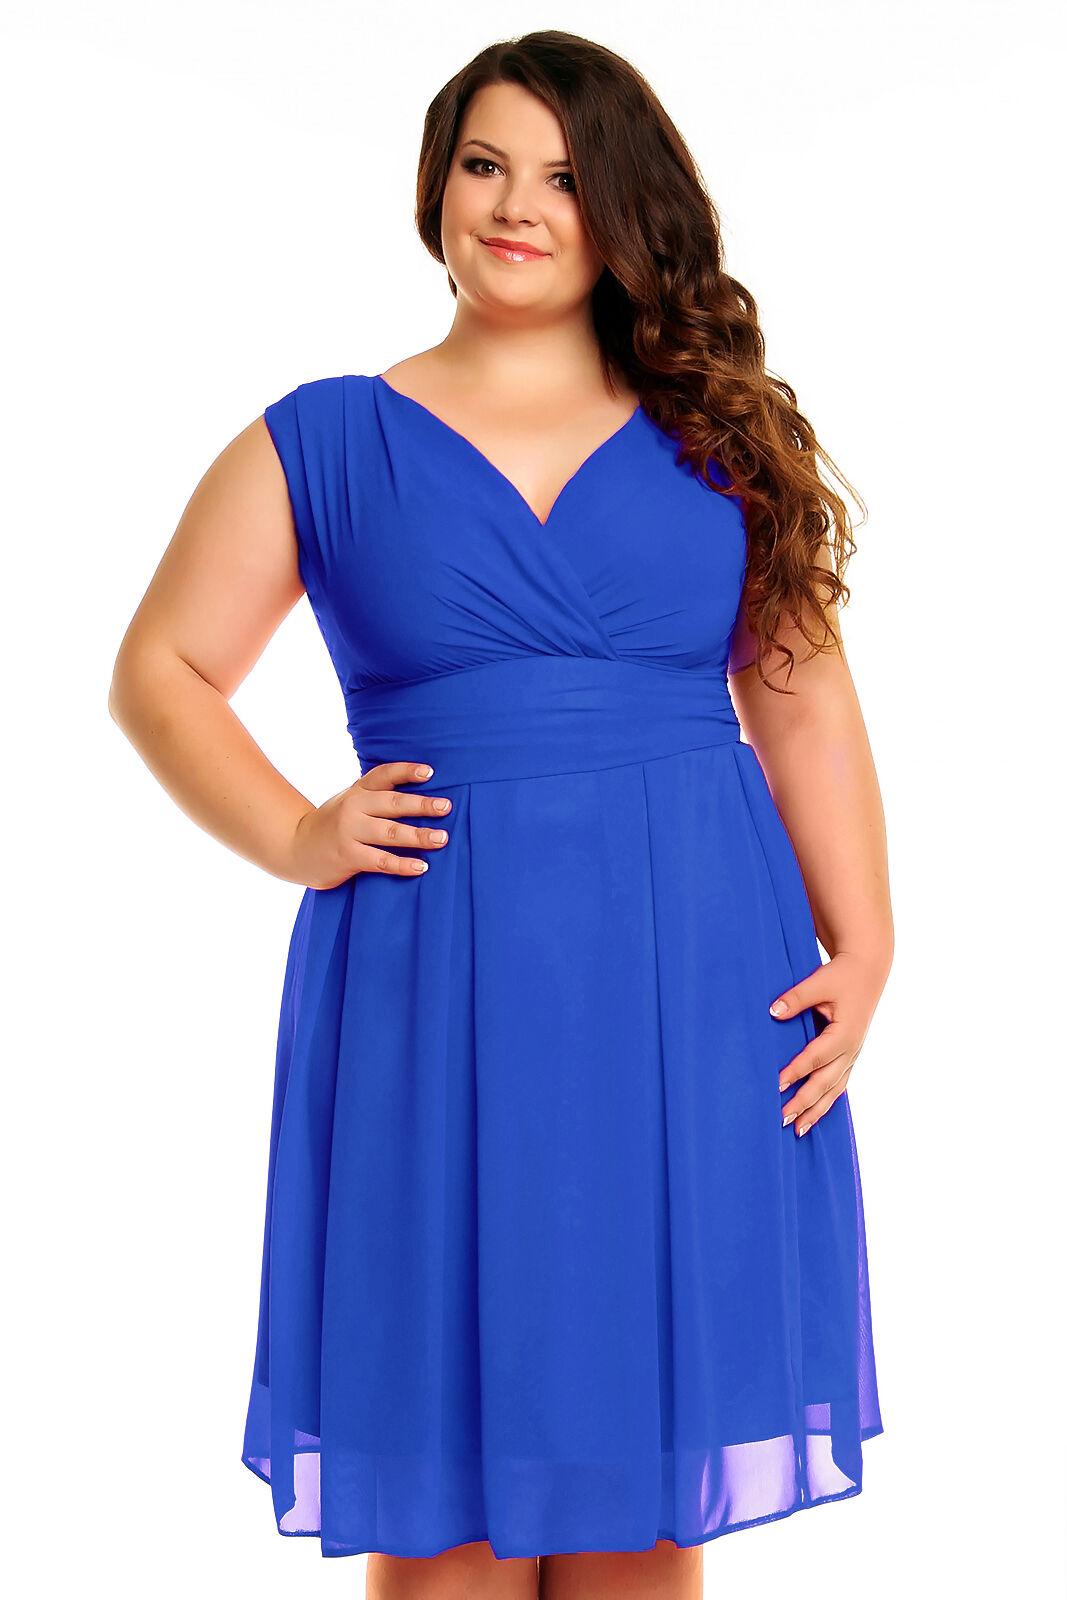 VictoriaV Chiffonkleid Cocktaikleid Abendkleid PlusGröße Übergröße Blau 44-50 NEU